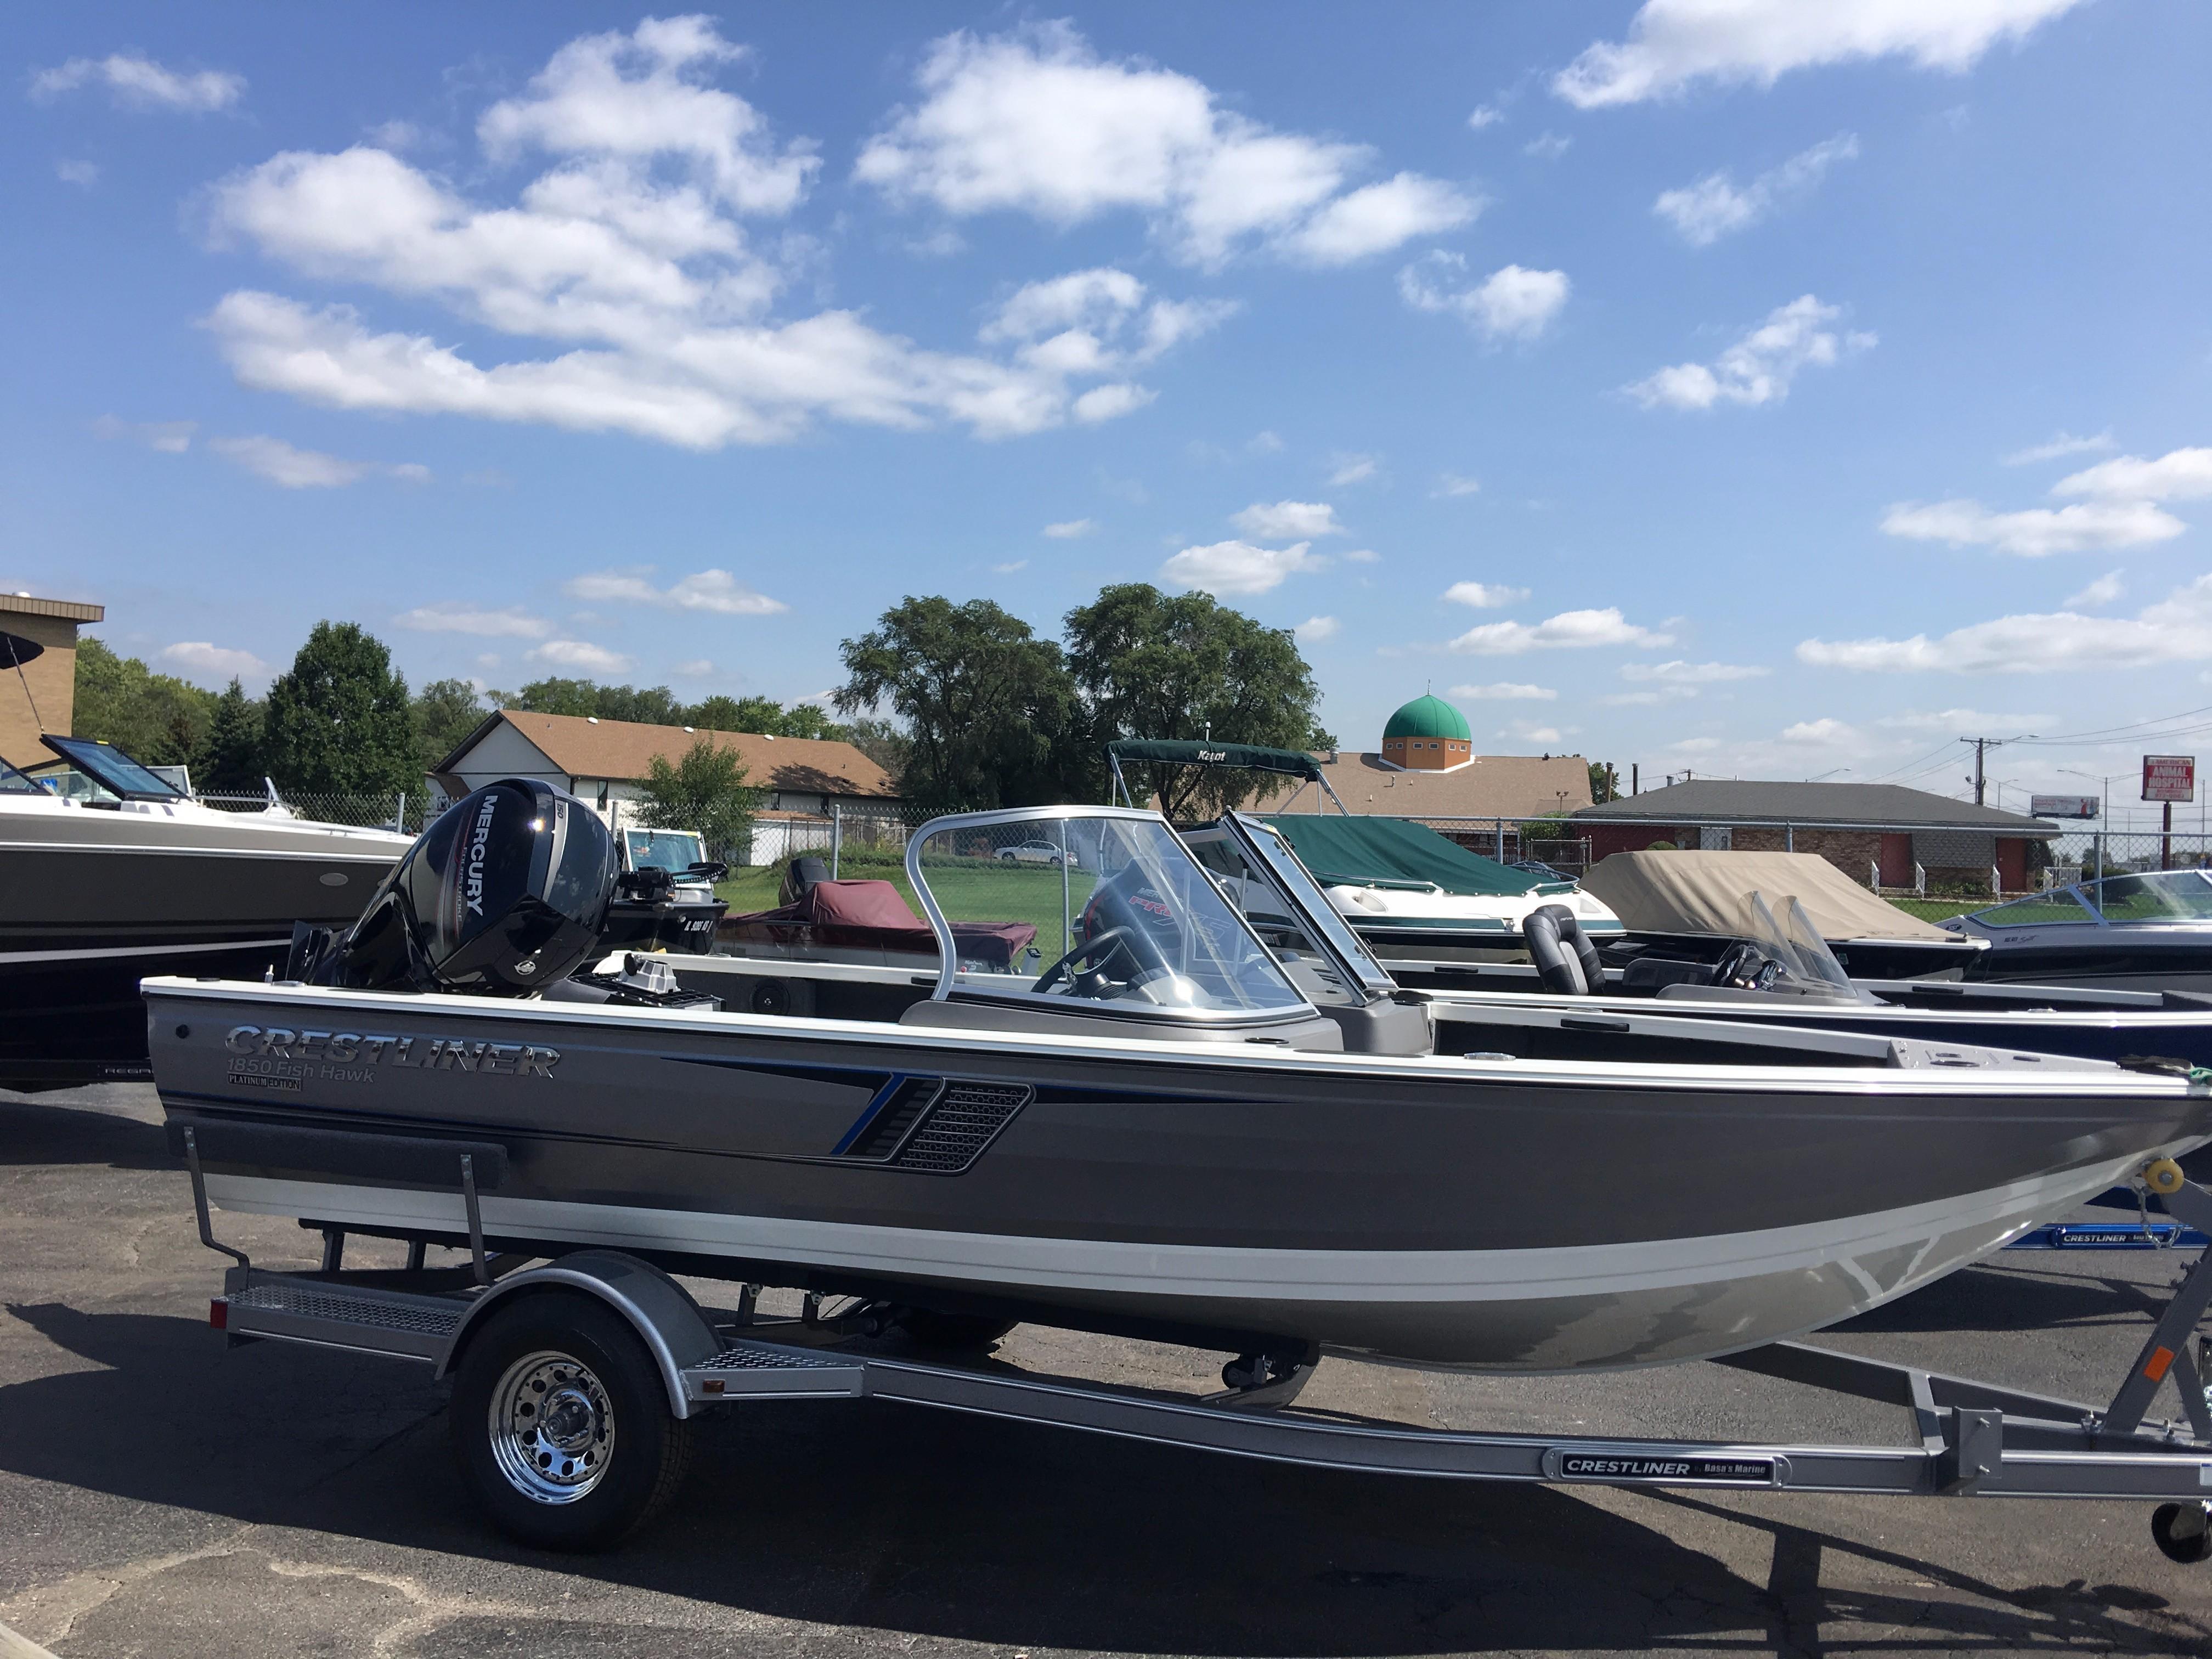 2018 Crestliner 1850 Fish Hawk Wt Power Boat For Sale Rhyachtworld: Fuel Tank Location On 1850 Fishhawk At Elf-jo.com